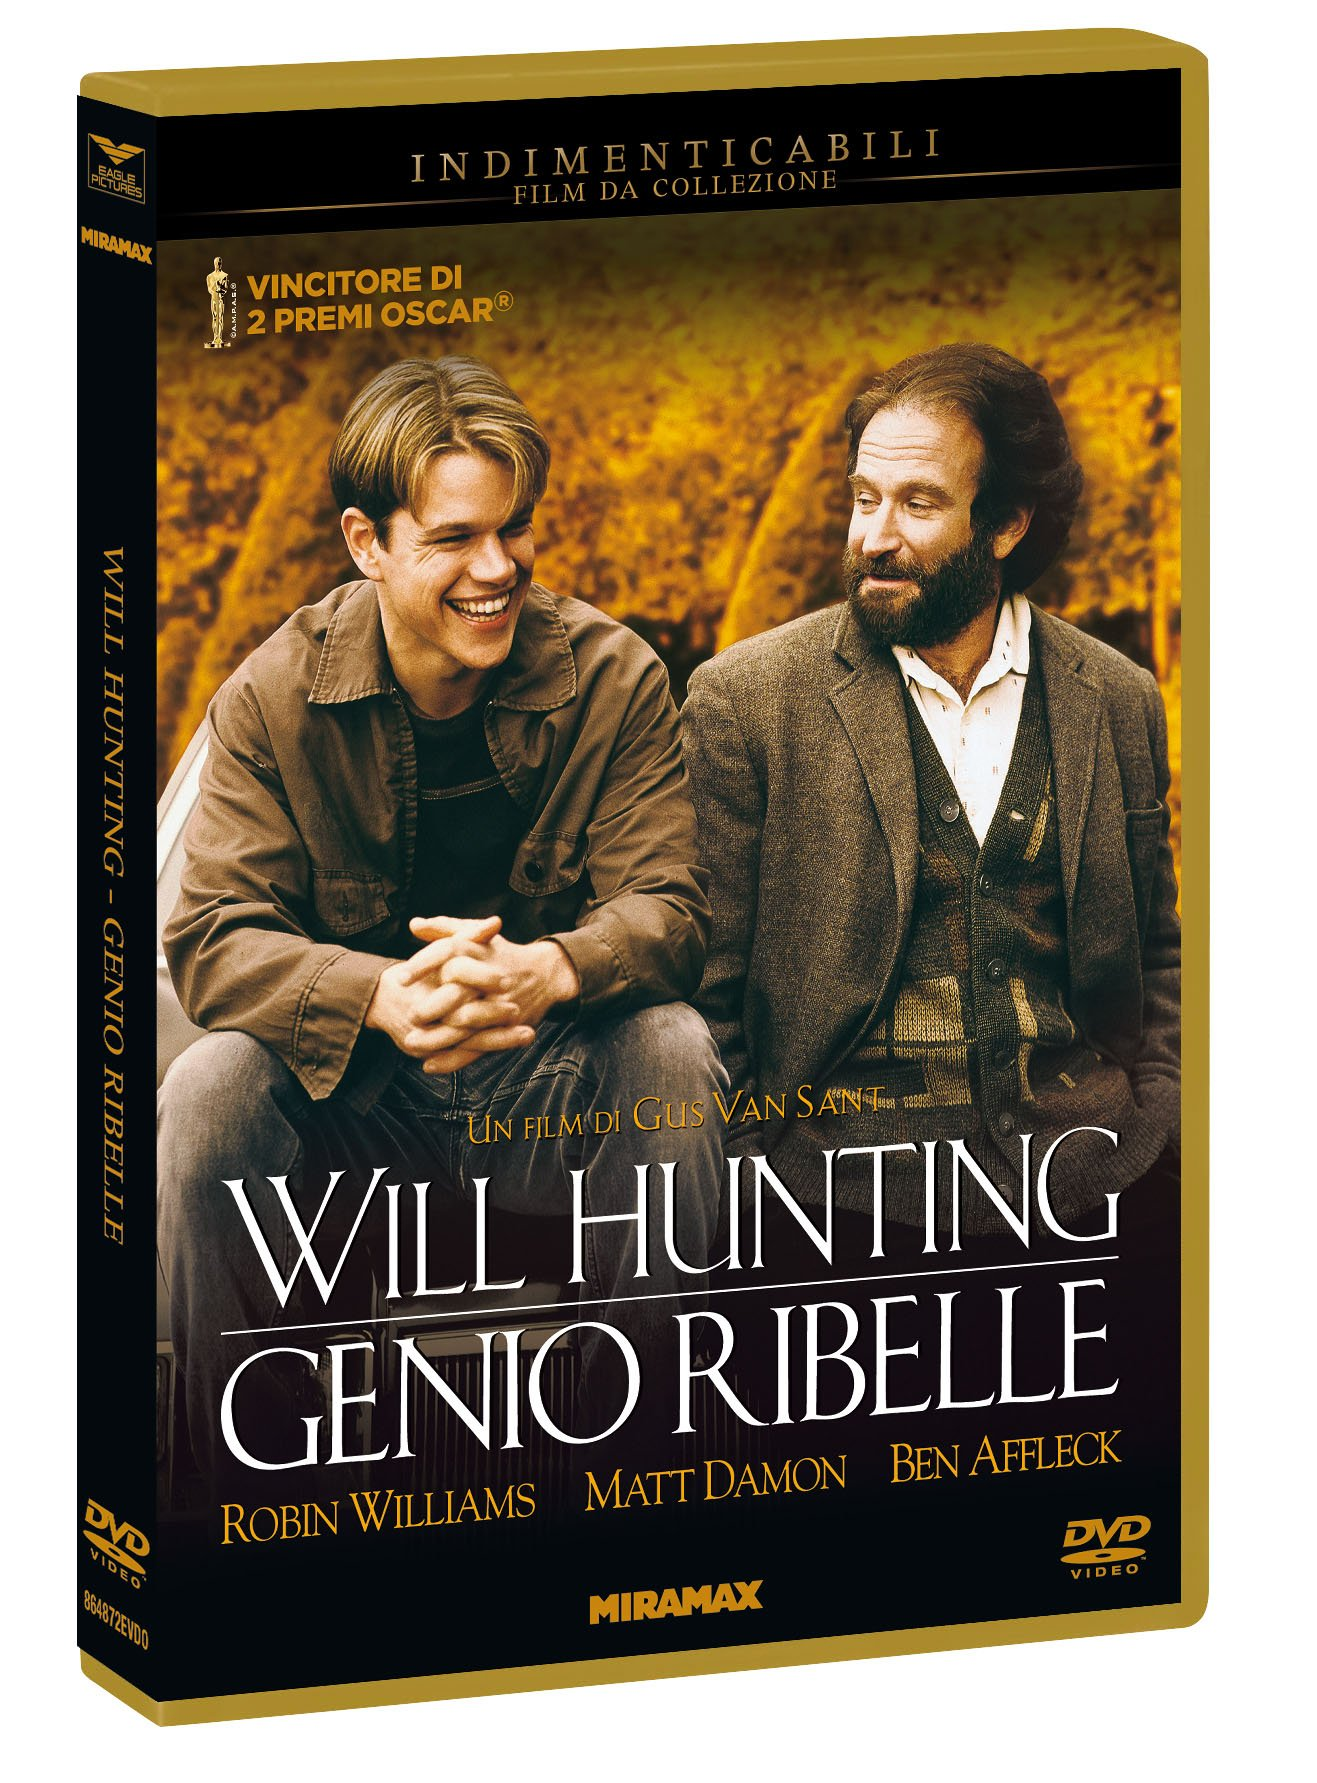 WILL HUNTING - GENIO RIBELLE (INDIMENTICABILI$6) - RMX (DVD)